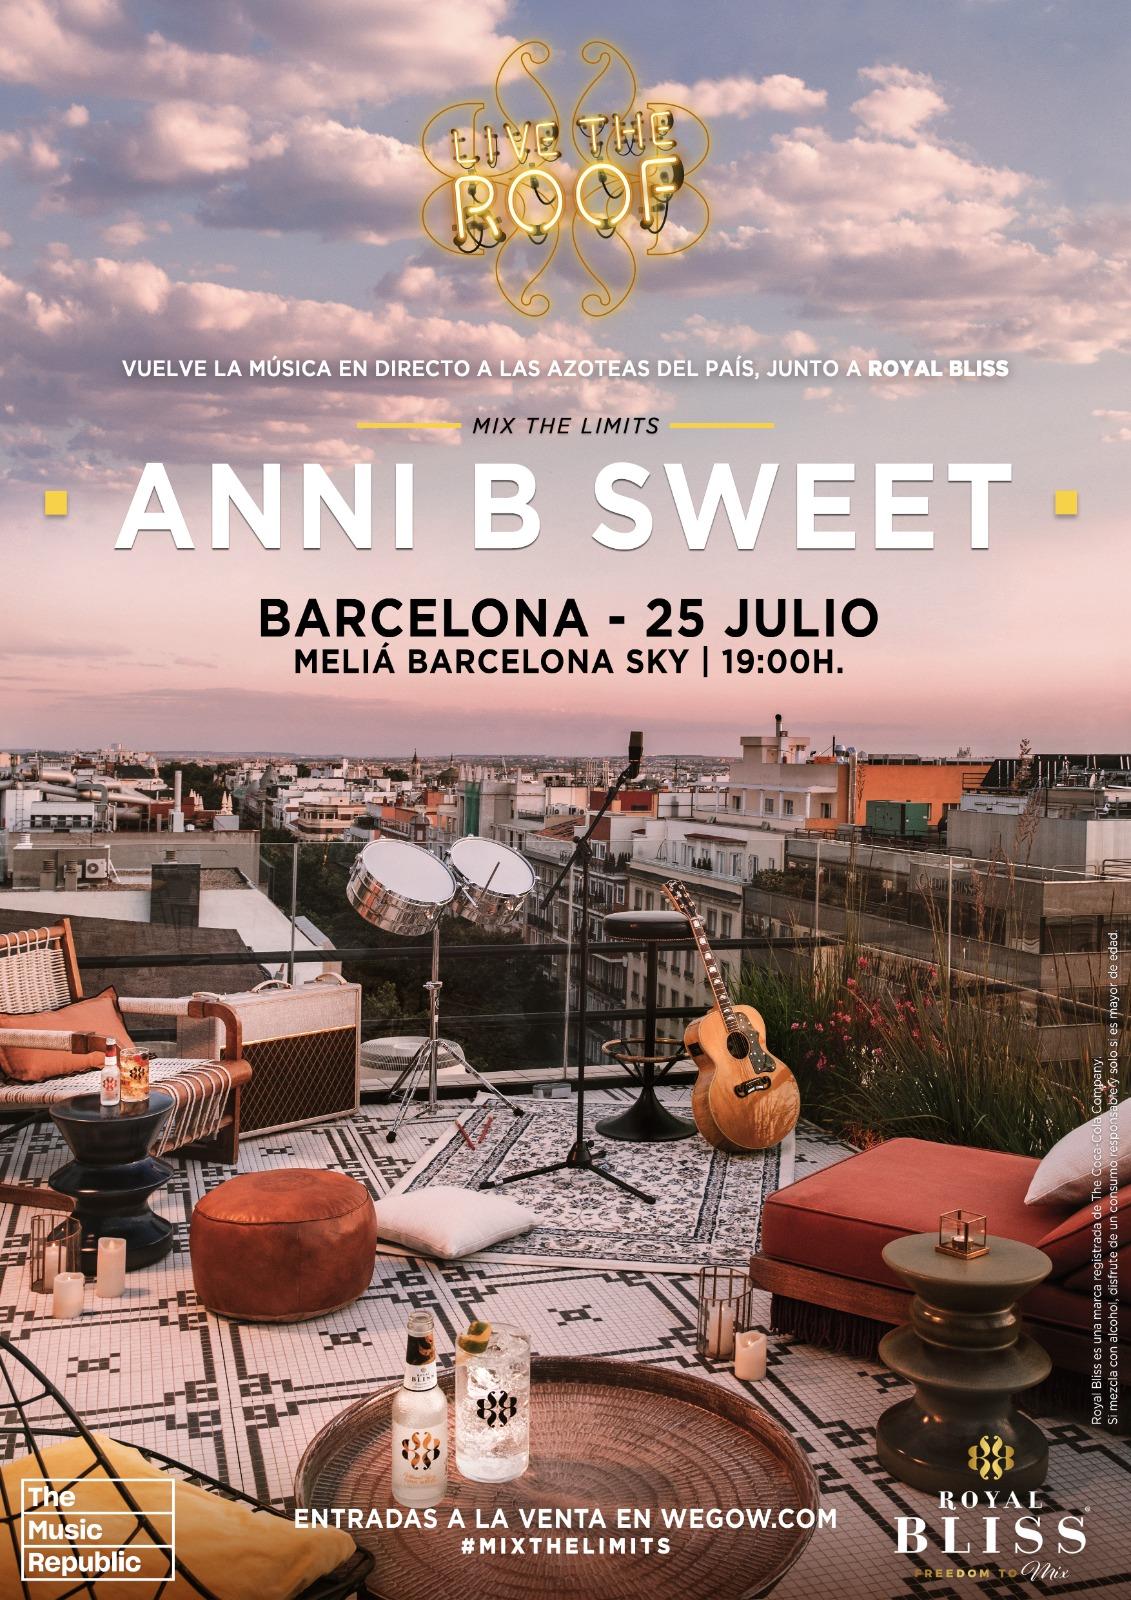 anni b sweet en live the roof barcelona 16236824732574737